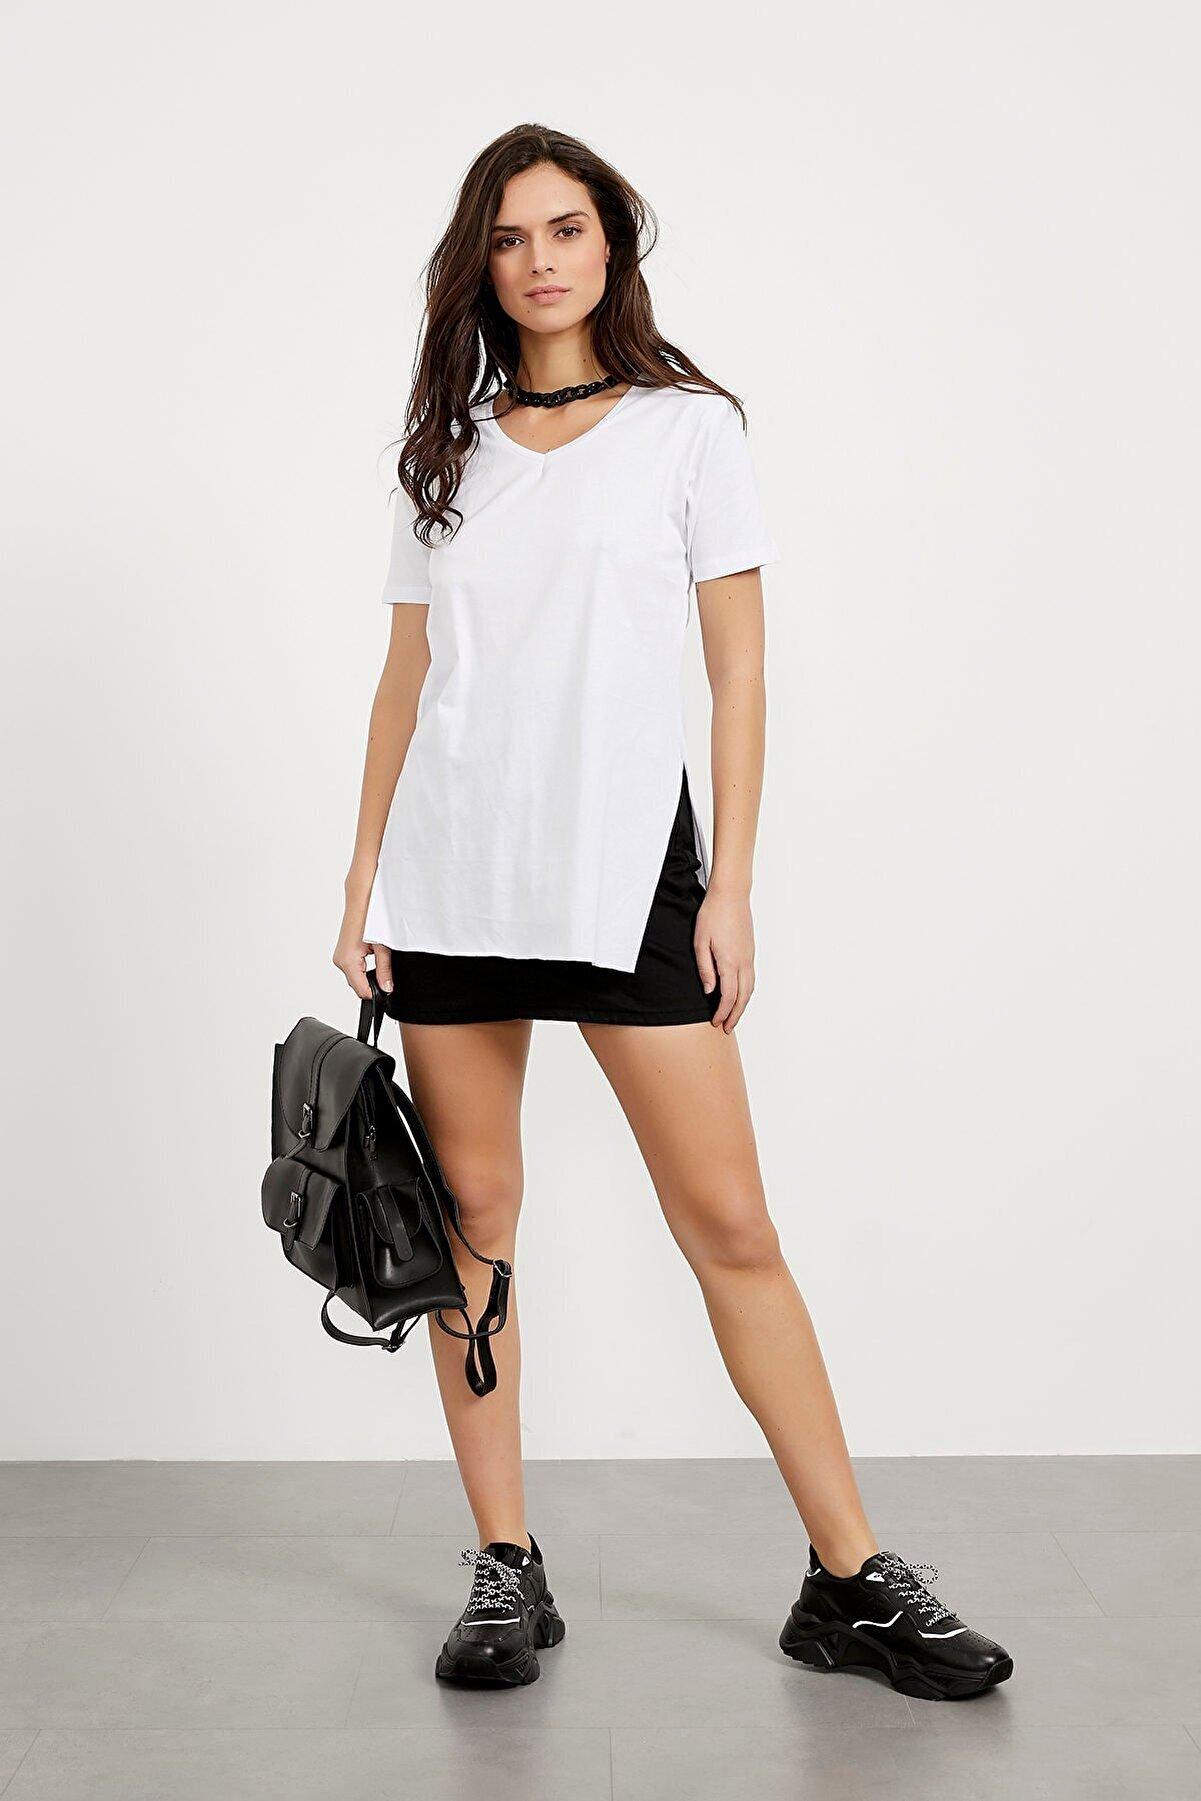 Arma Life Kadın Beyaz  V Yaka Yırtmaçlı Basic T-shirt